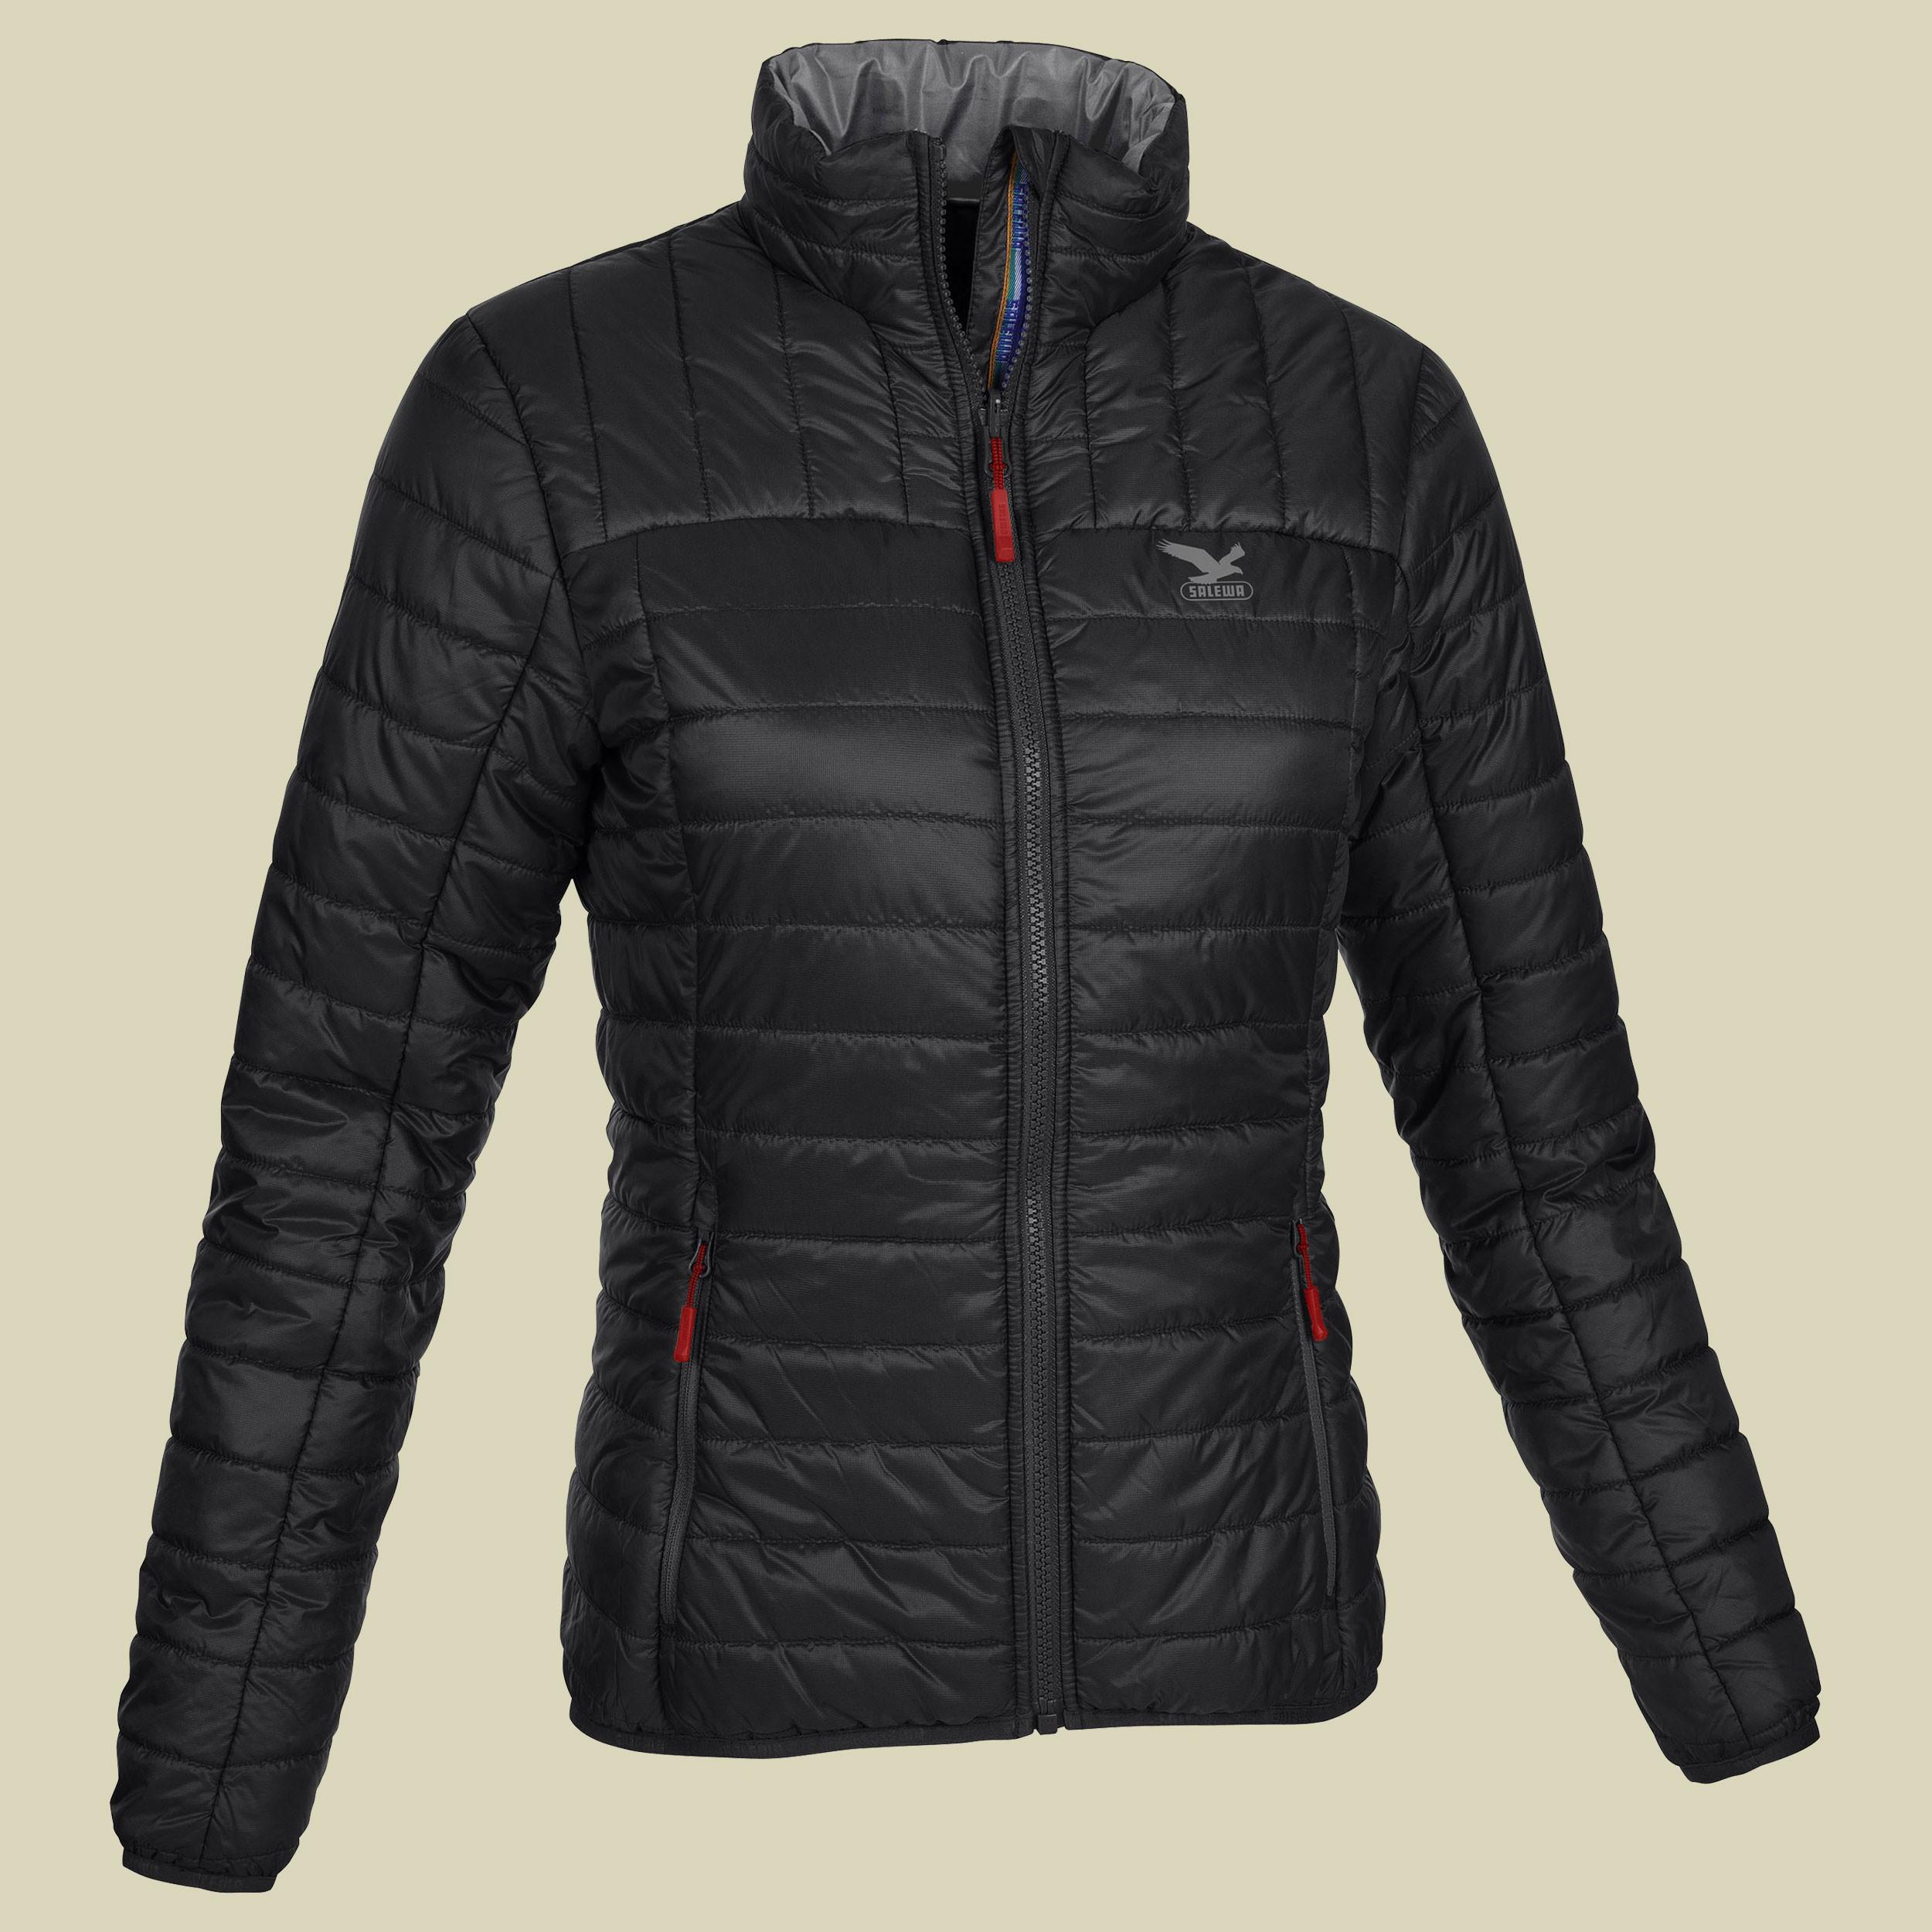 online store da5de b4bb4 Salewa Chivasso PRL Jacket Women - PrimaLoft Jacke Damen ...